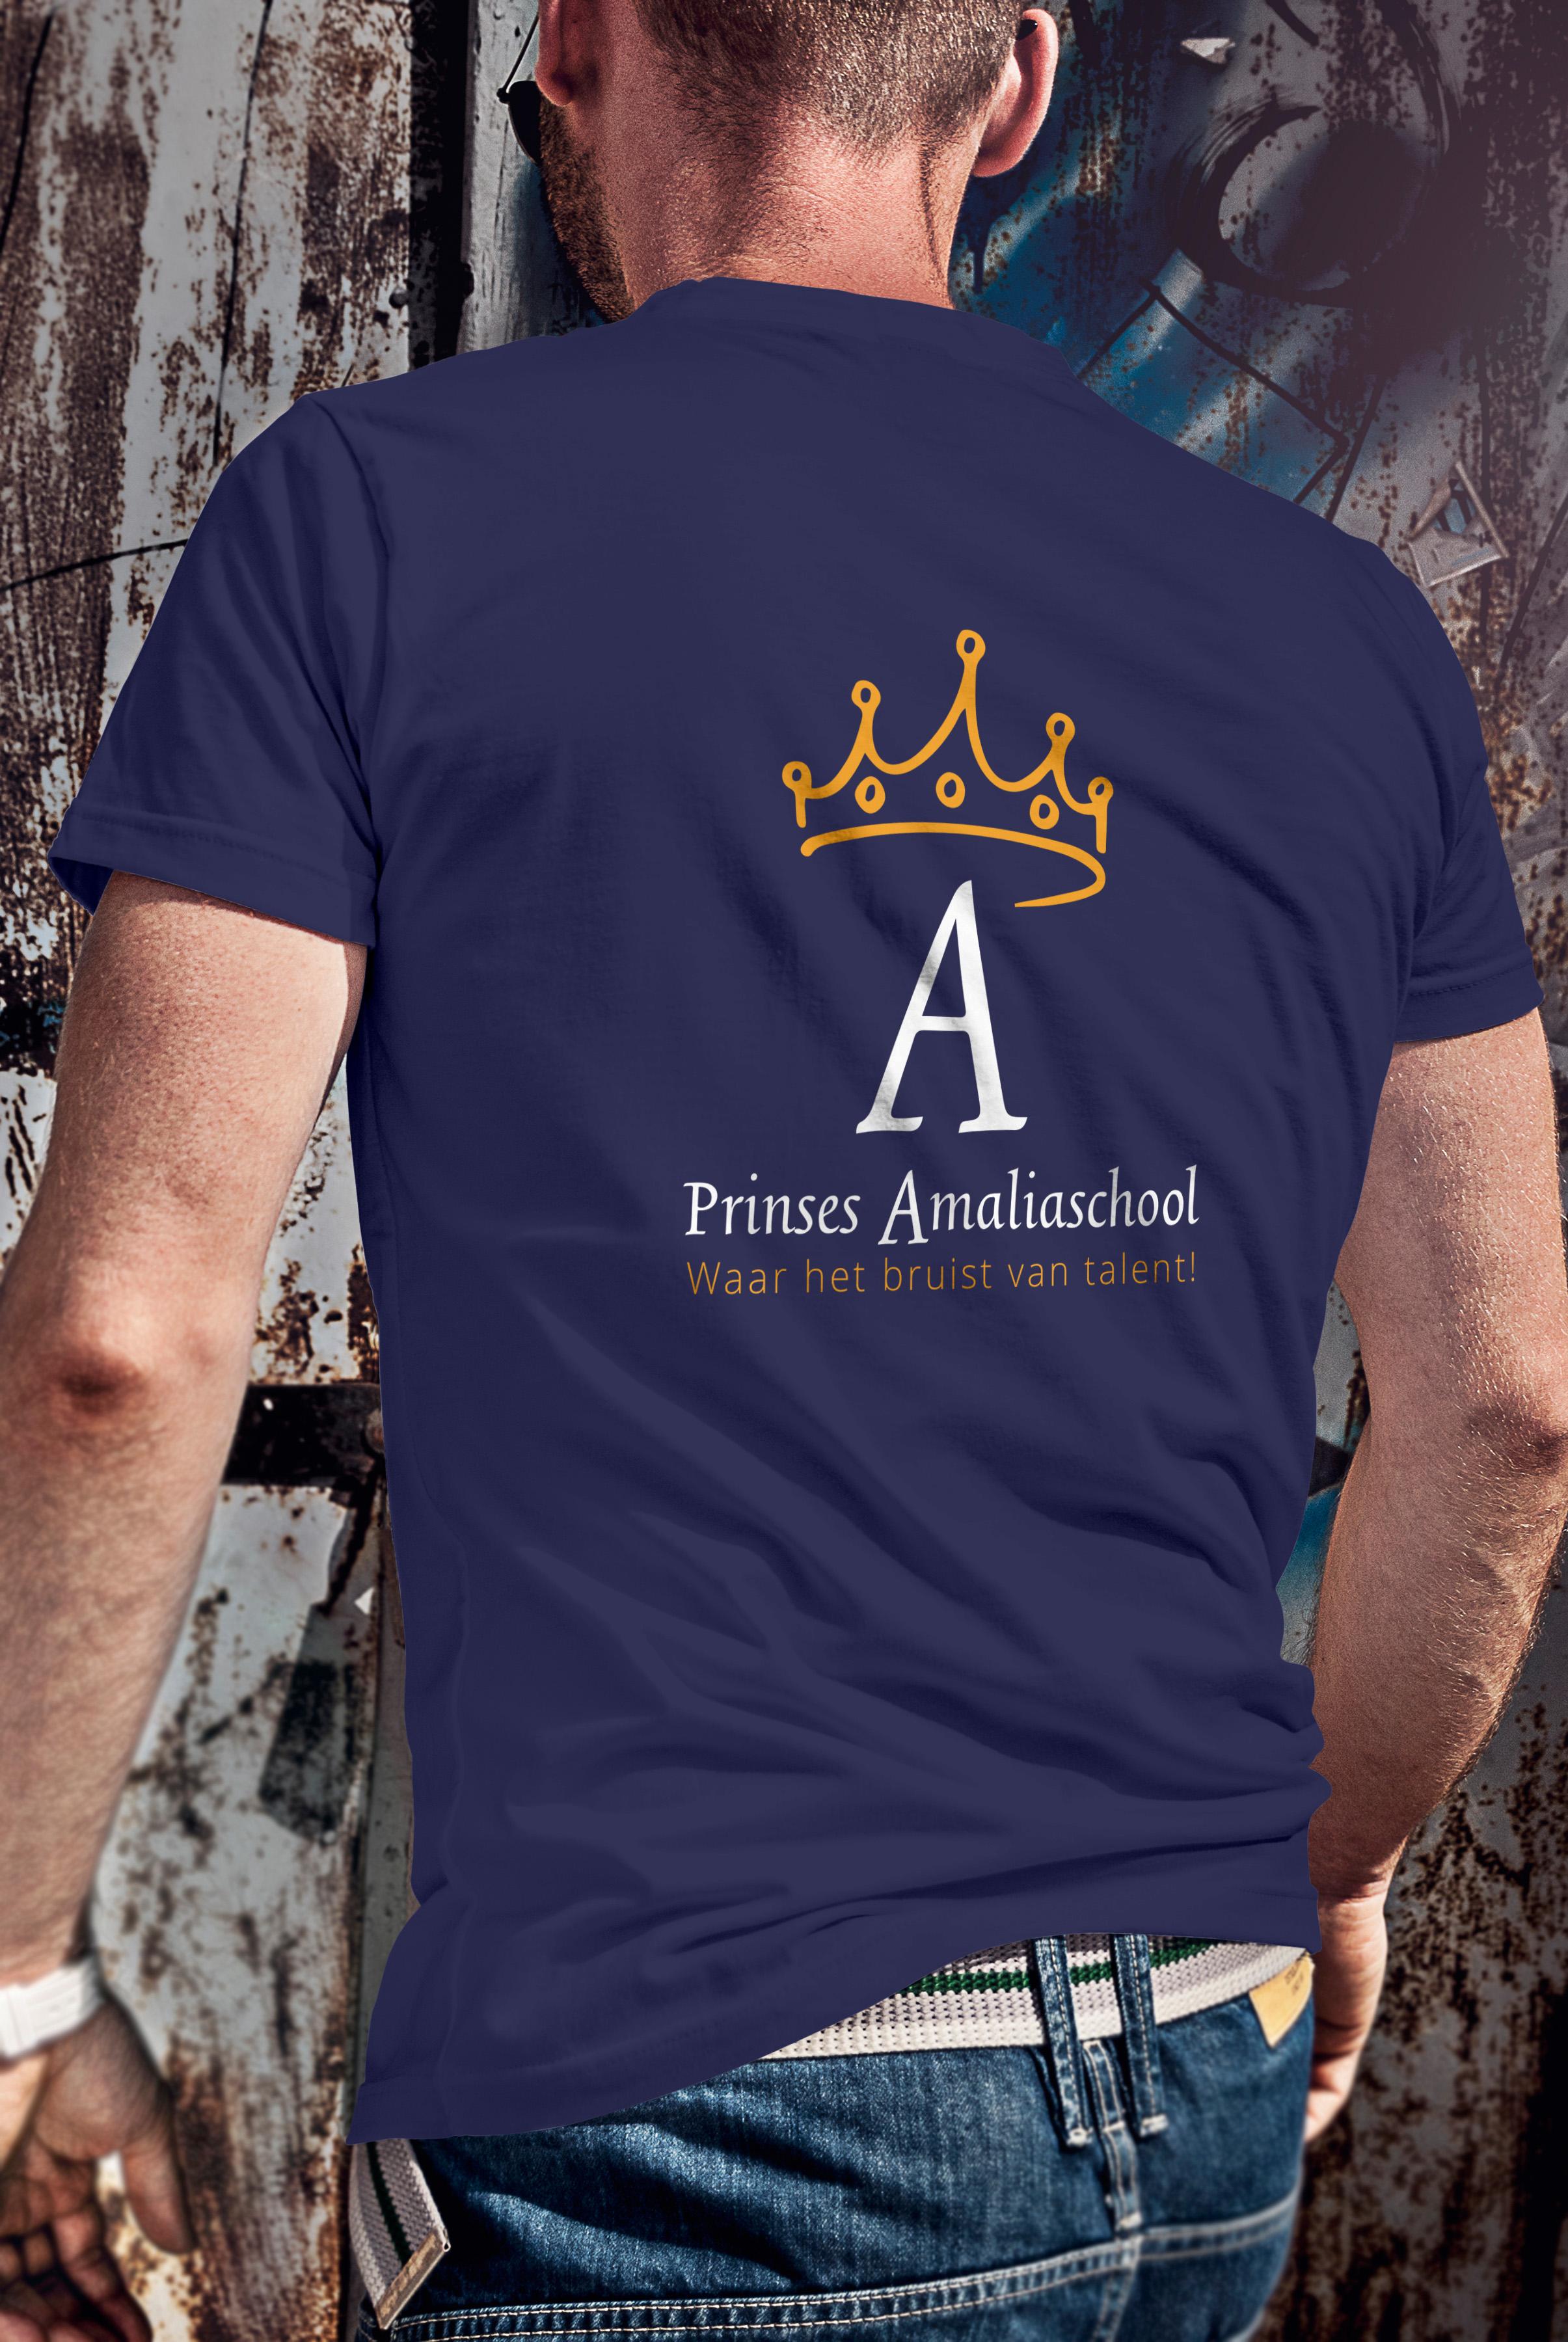 03_T-shirt Mockup_MANn amalia back